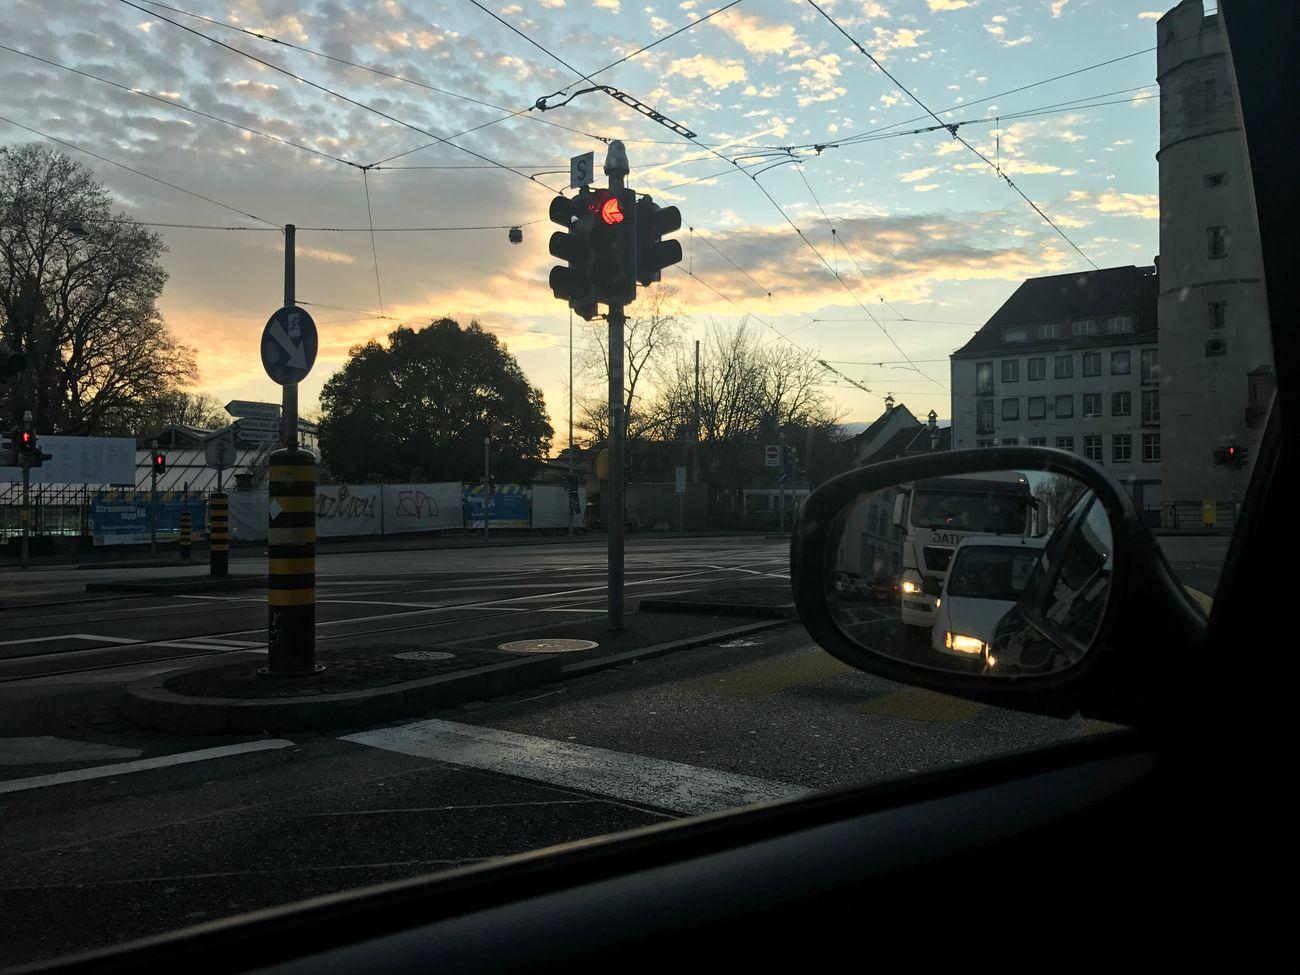 Basel my love ❤️ Sunrise Basel Photography Spalentor Onmywaytowork